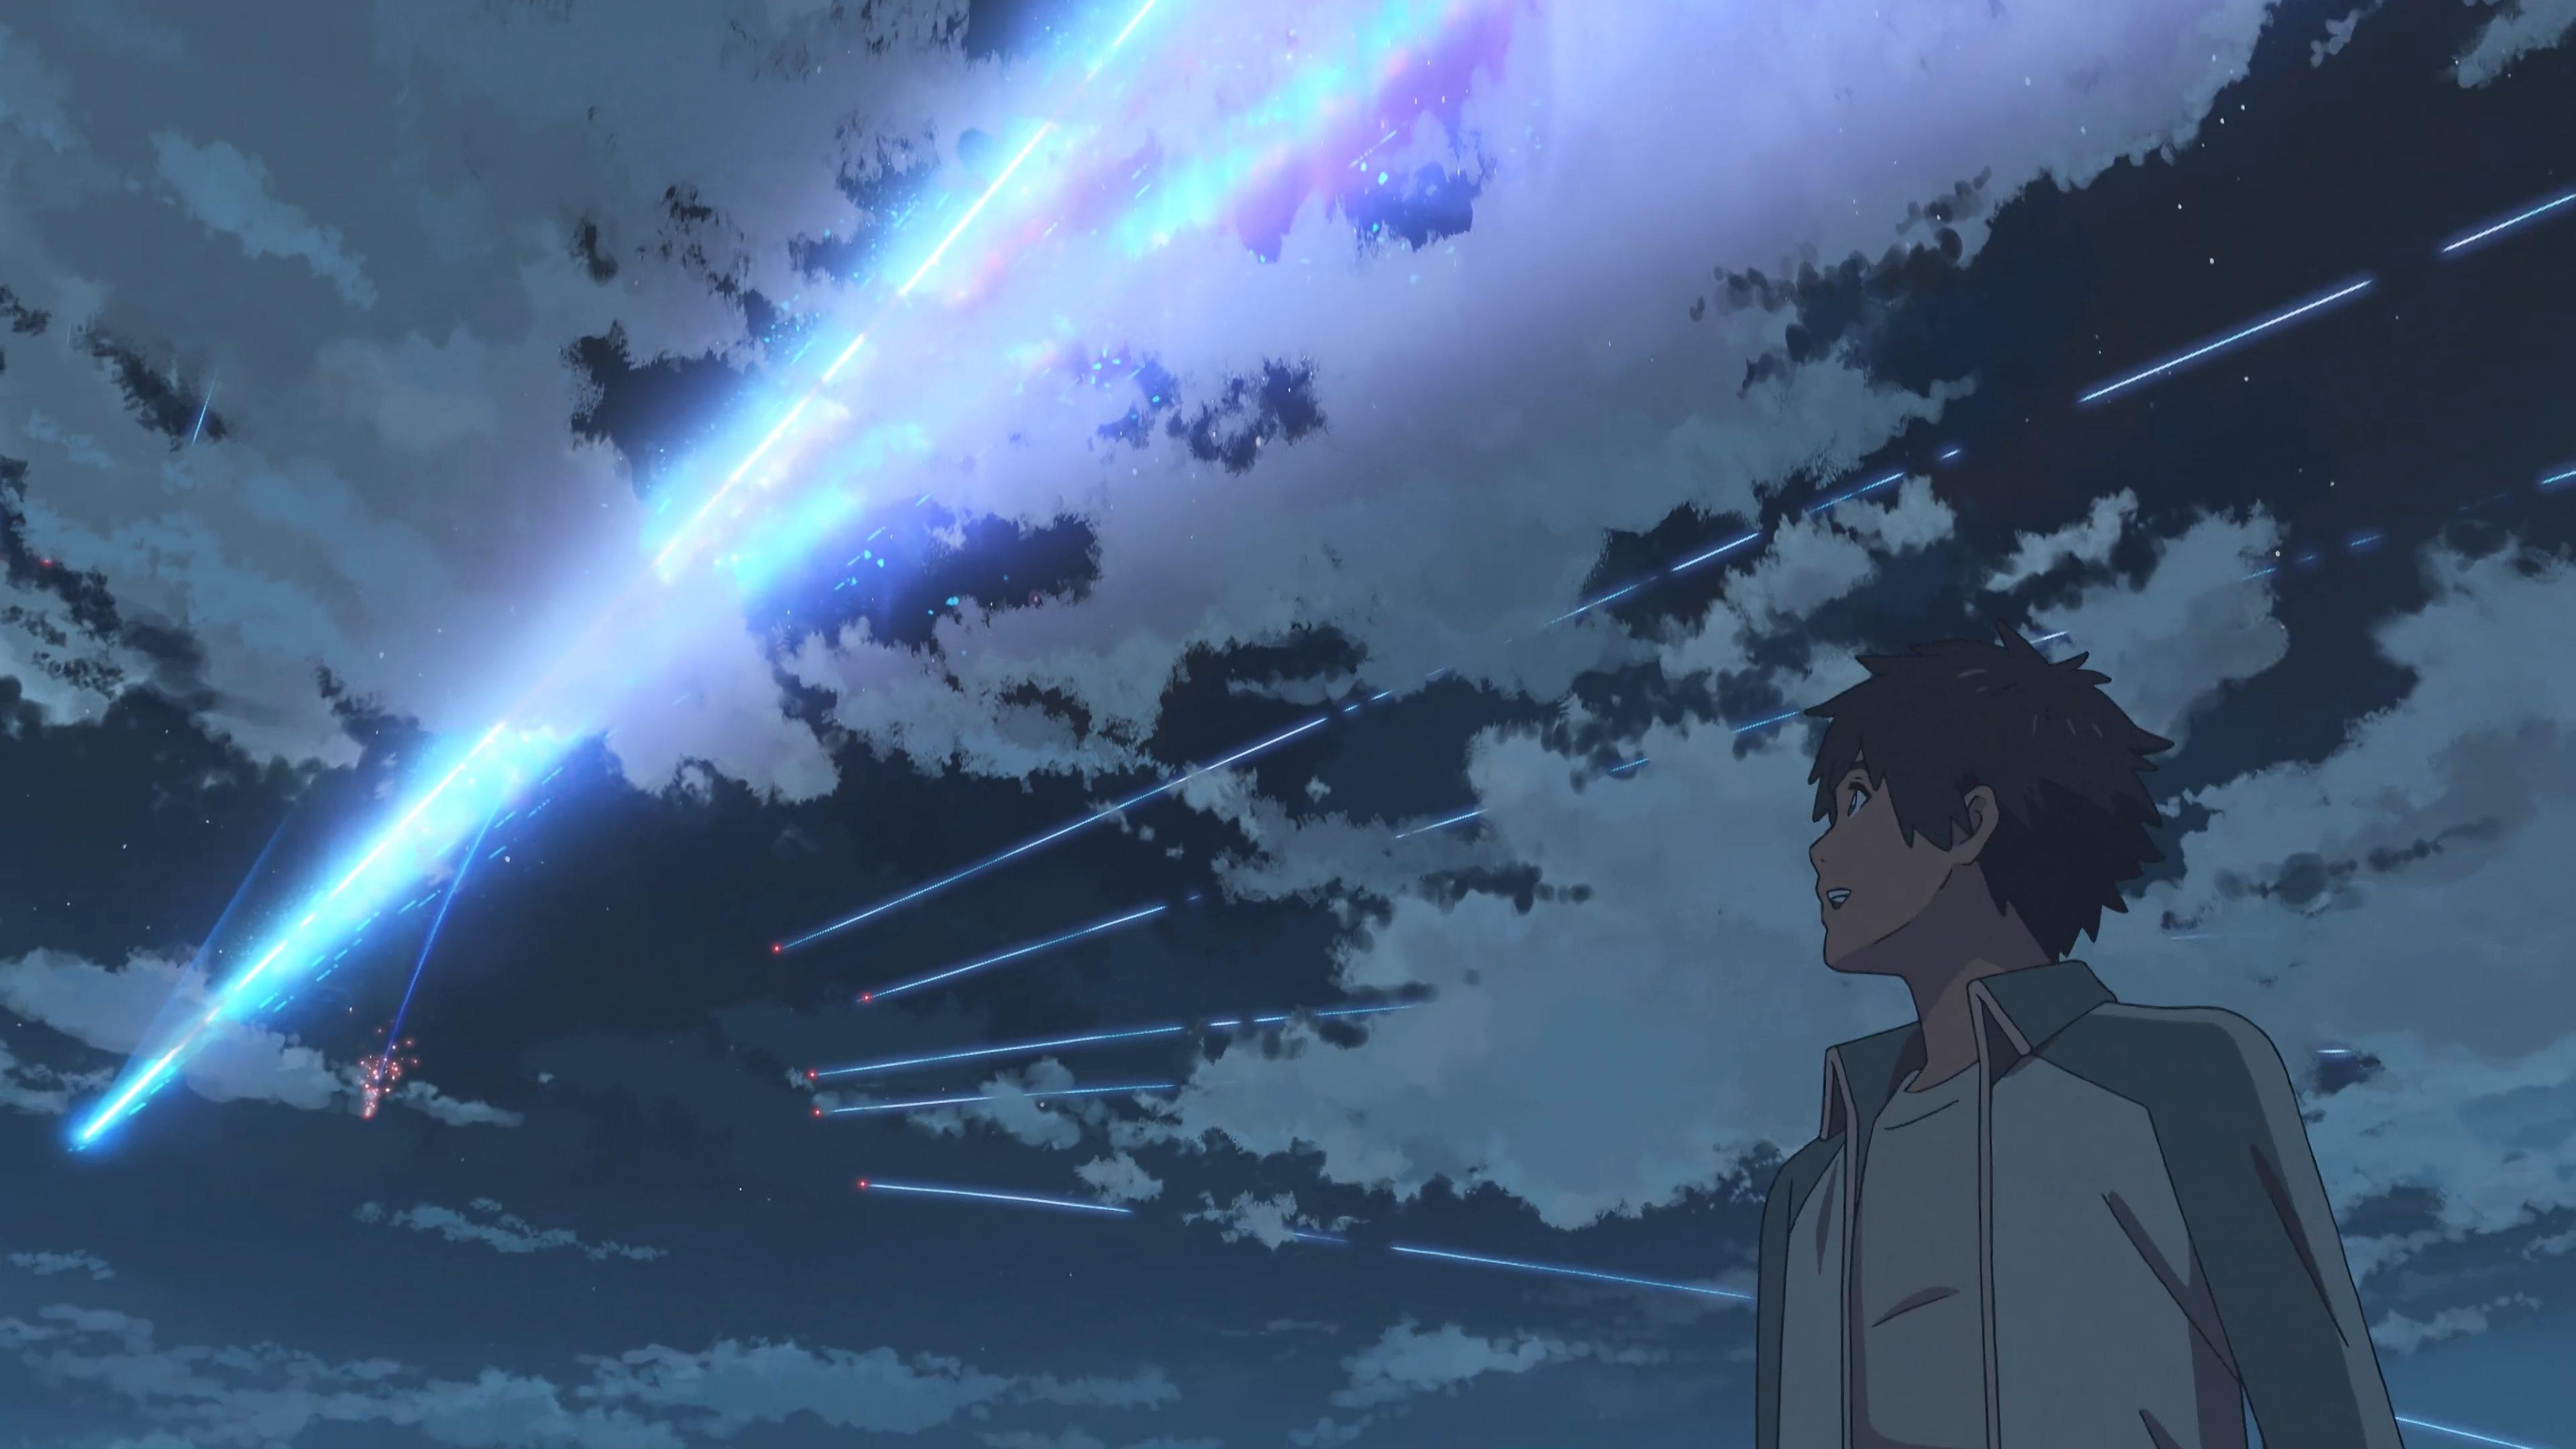 Oc Kimi No Na Wa Your Name Meteor Taki 4k By Total Chuck On